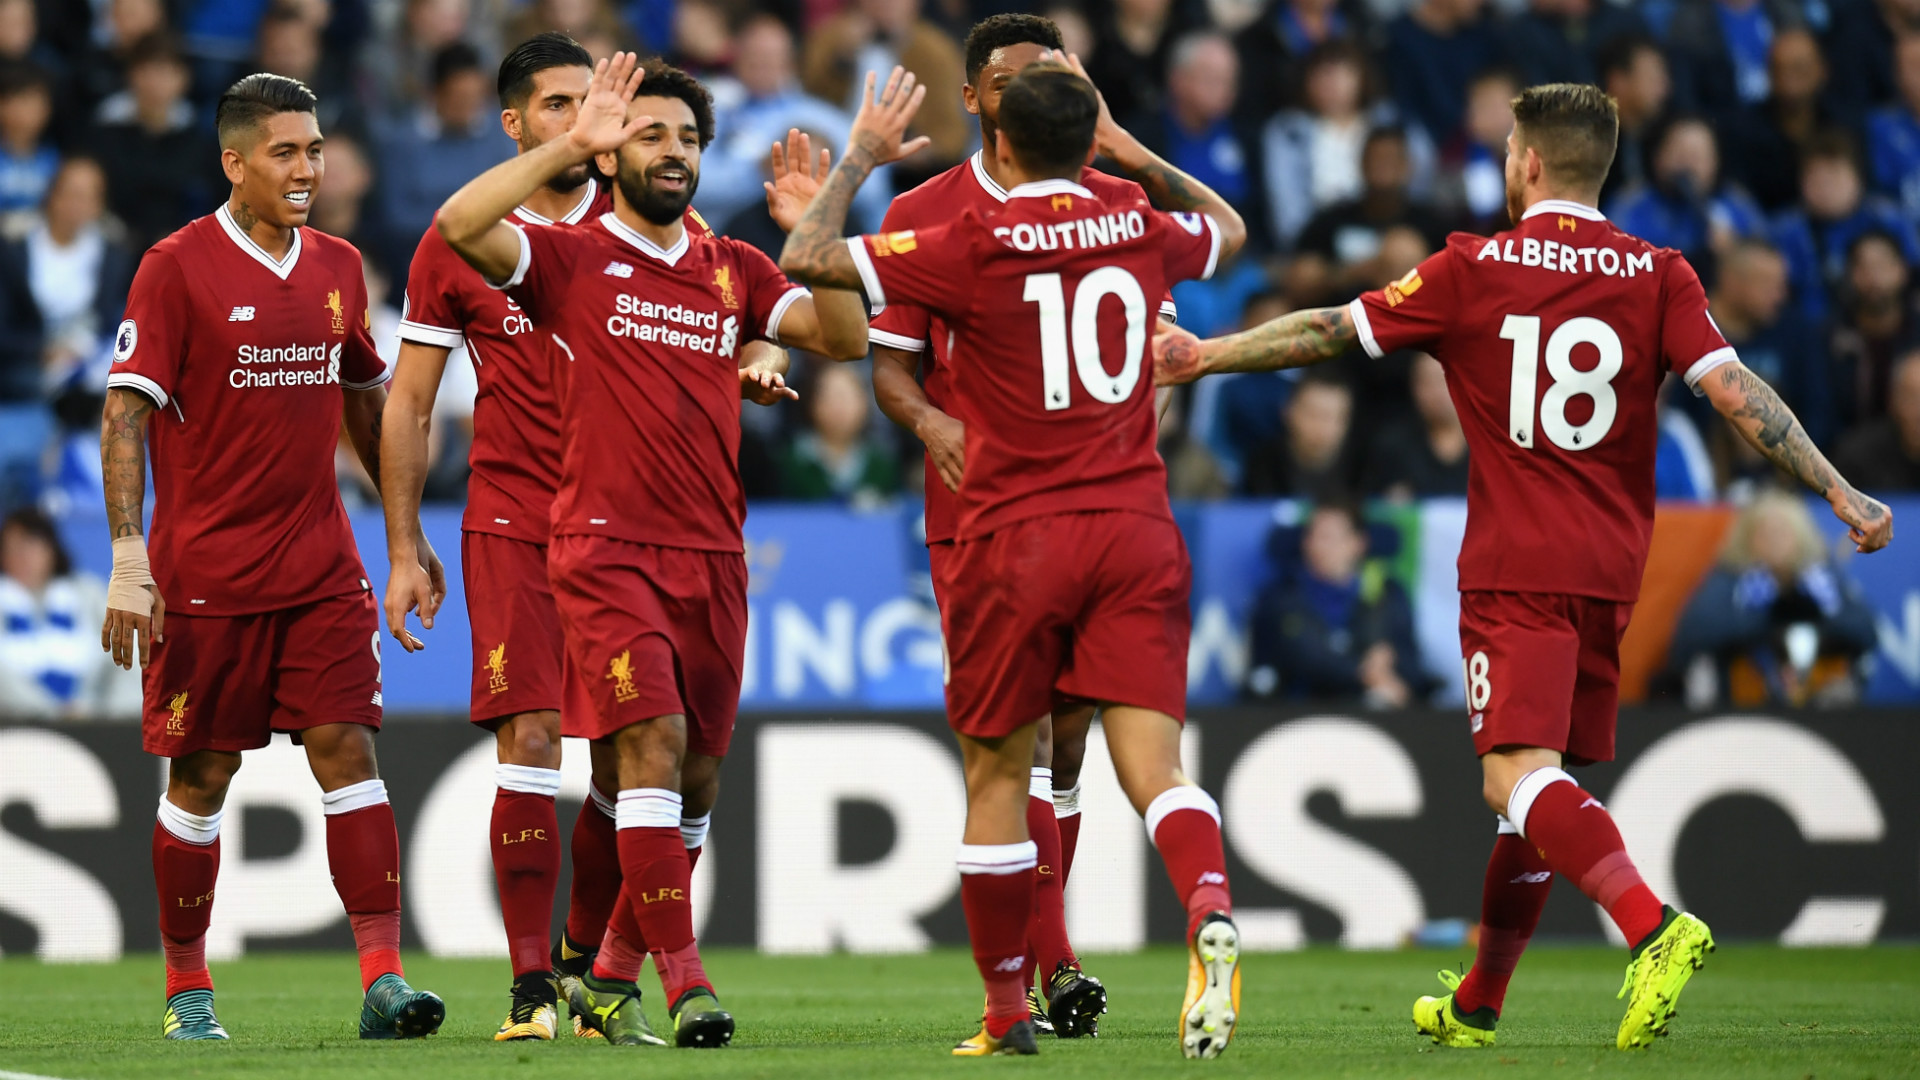 HD Salah Coutinho Liverpool celebrate